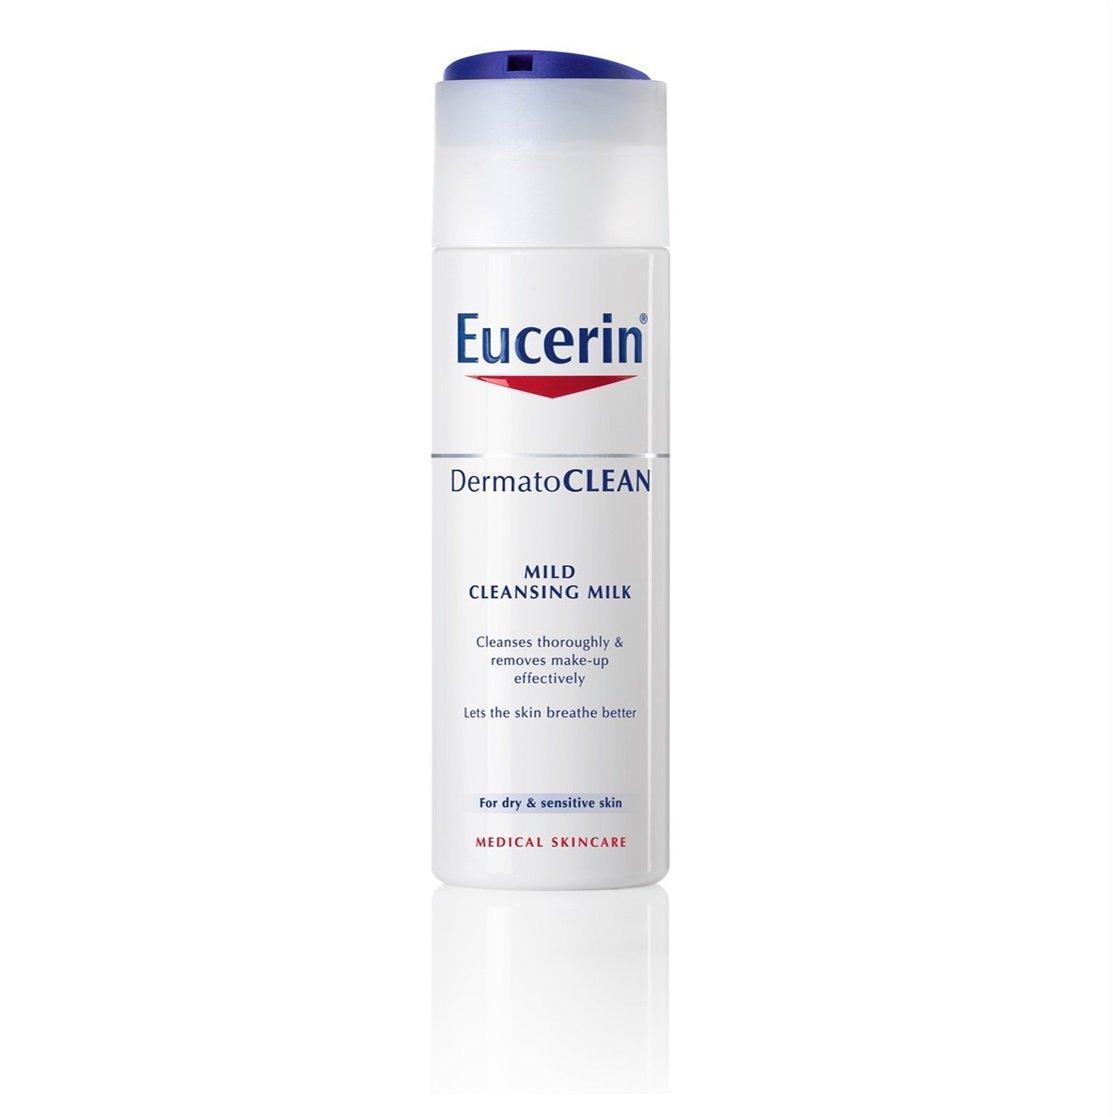 eucerin cleansing milk